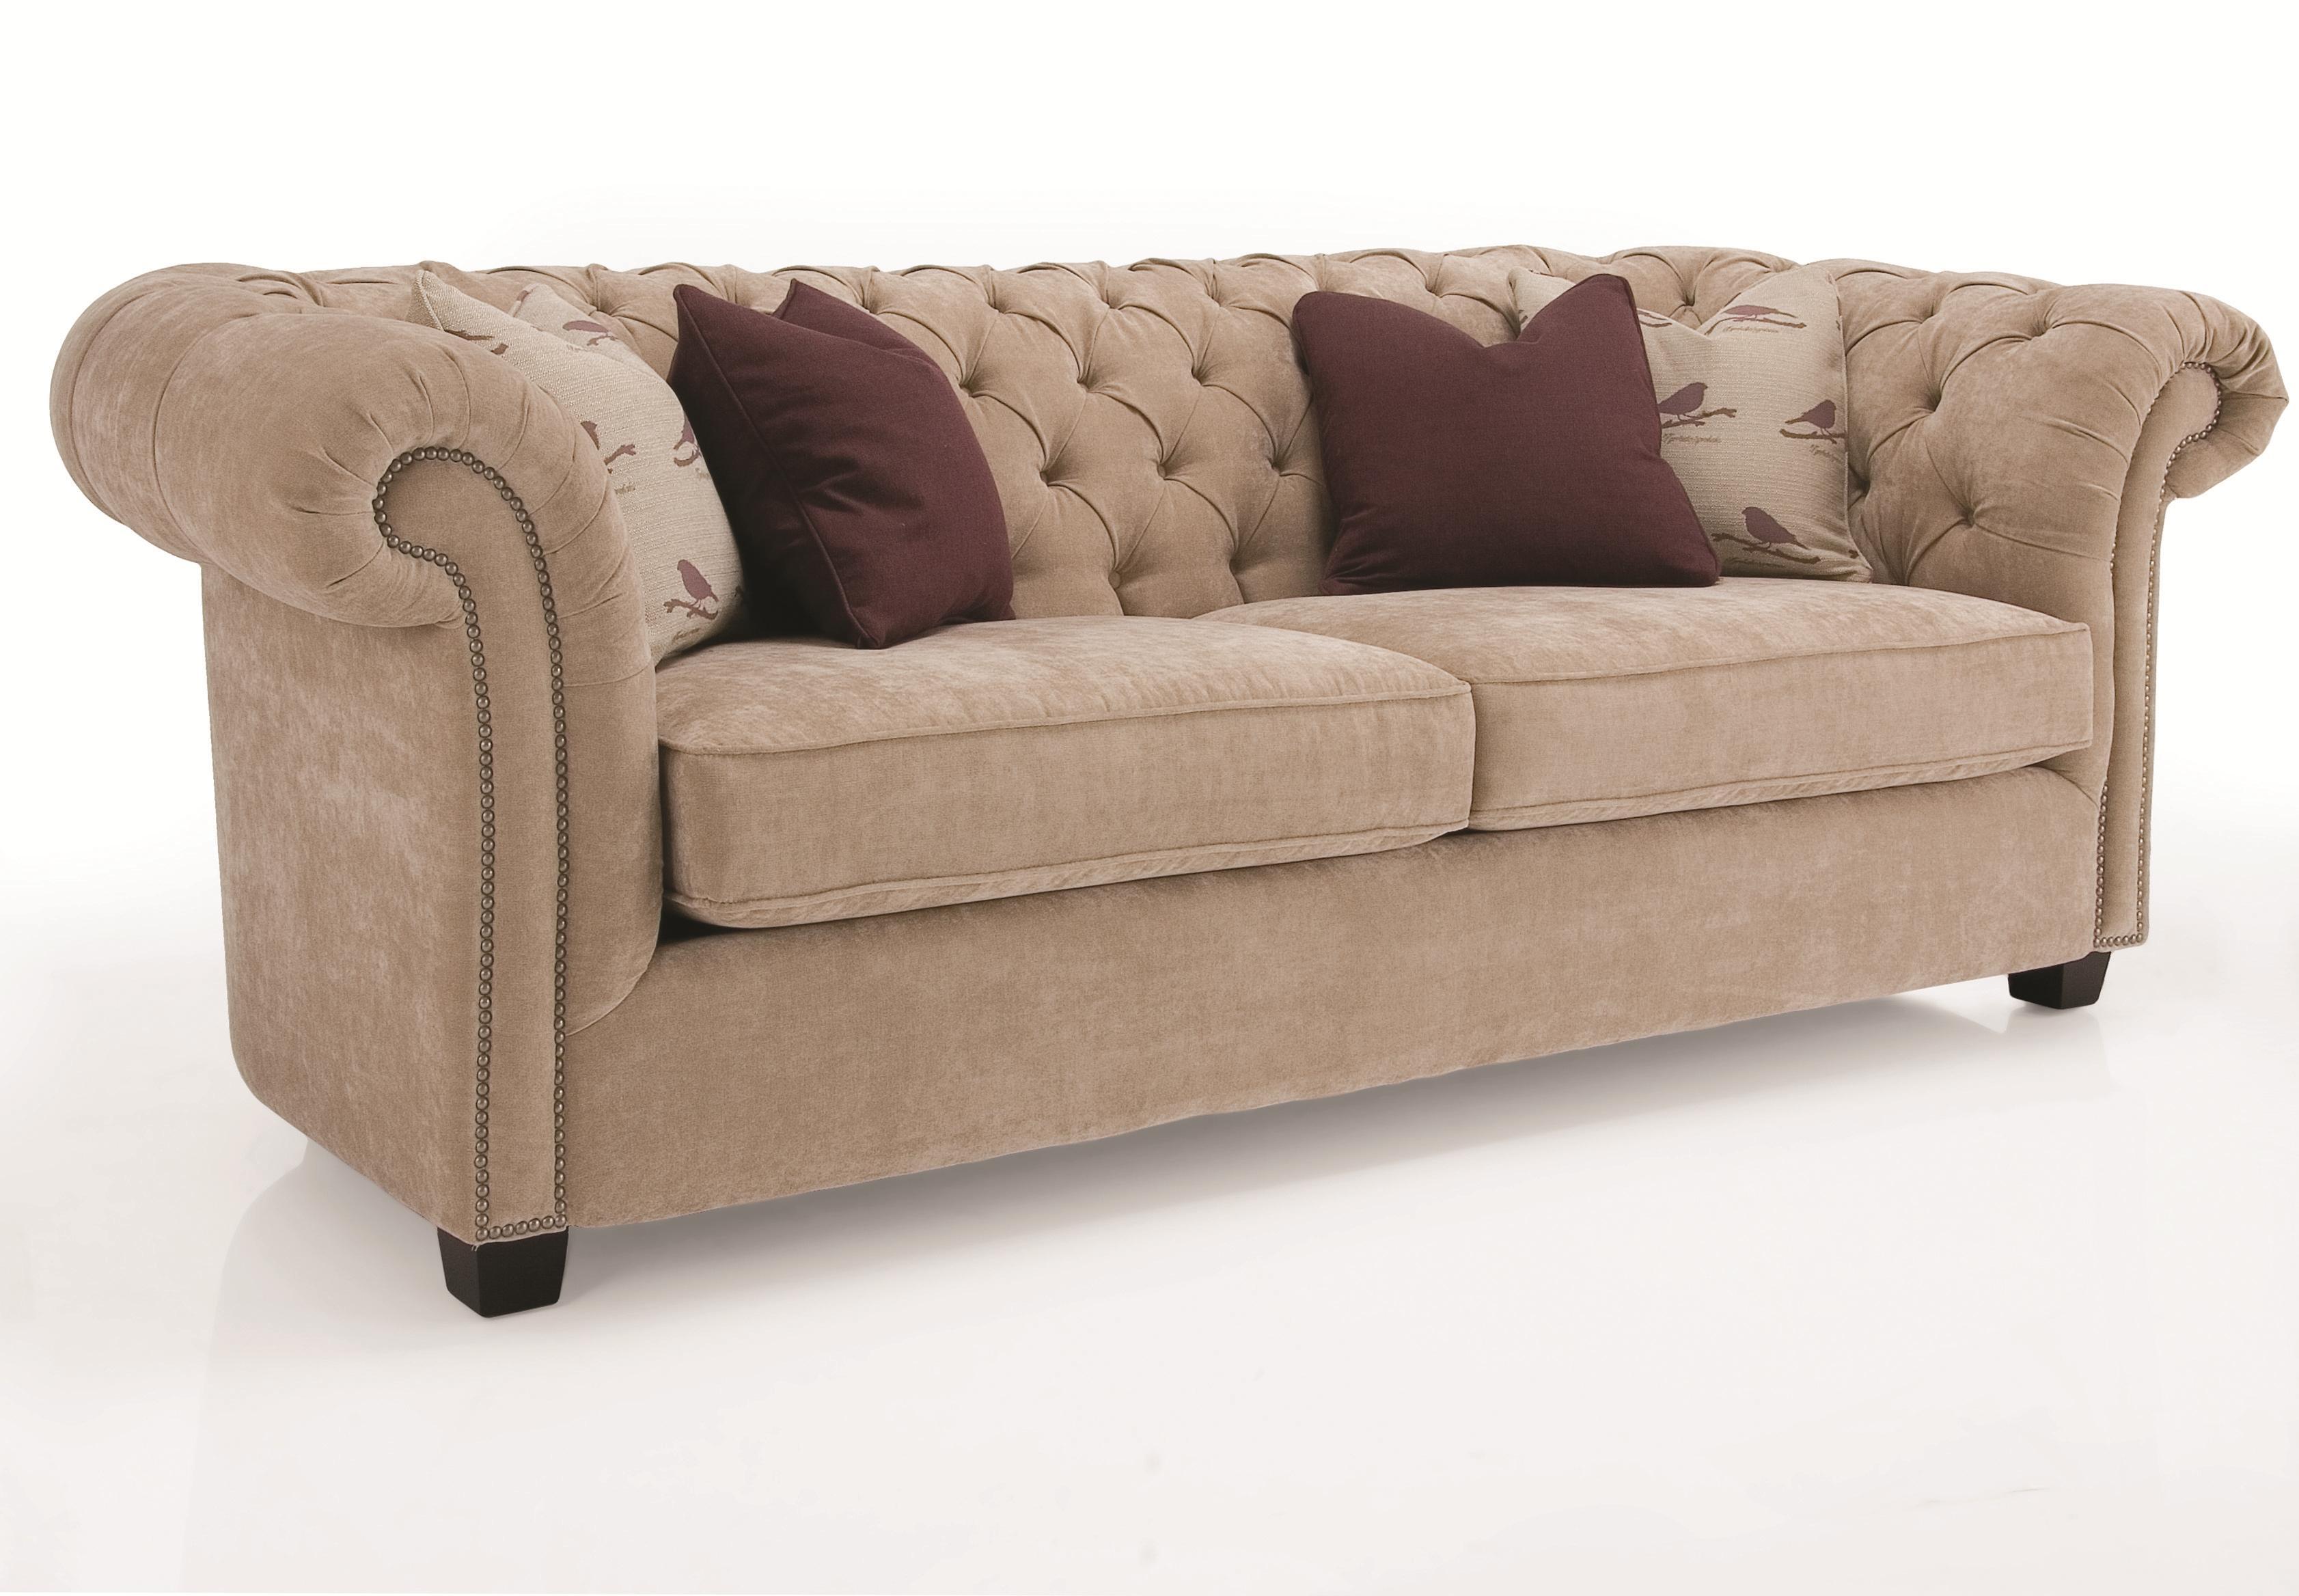 Decor-Rest Churchill Churchill Sofa - Item Number: 7000 S